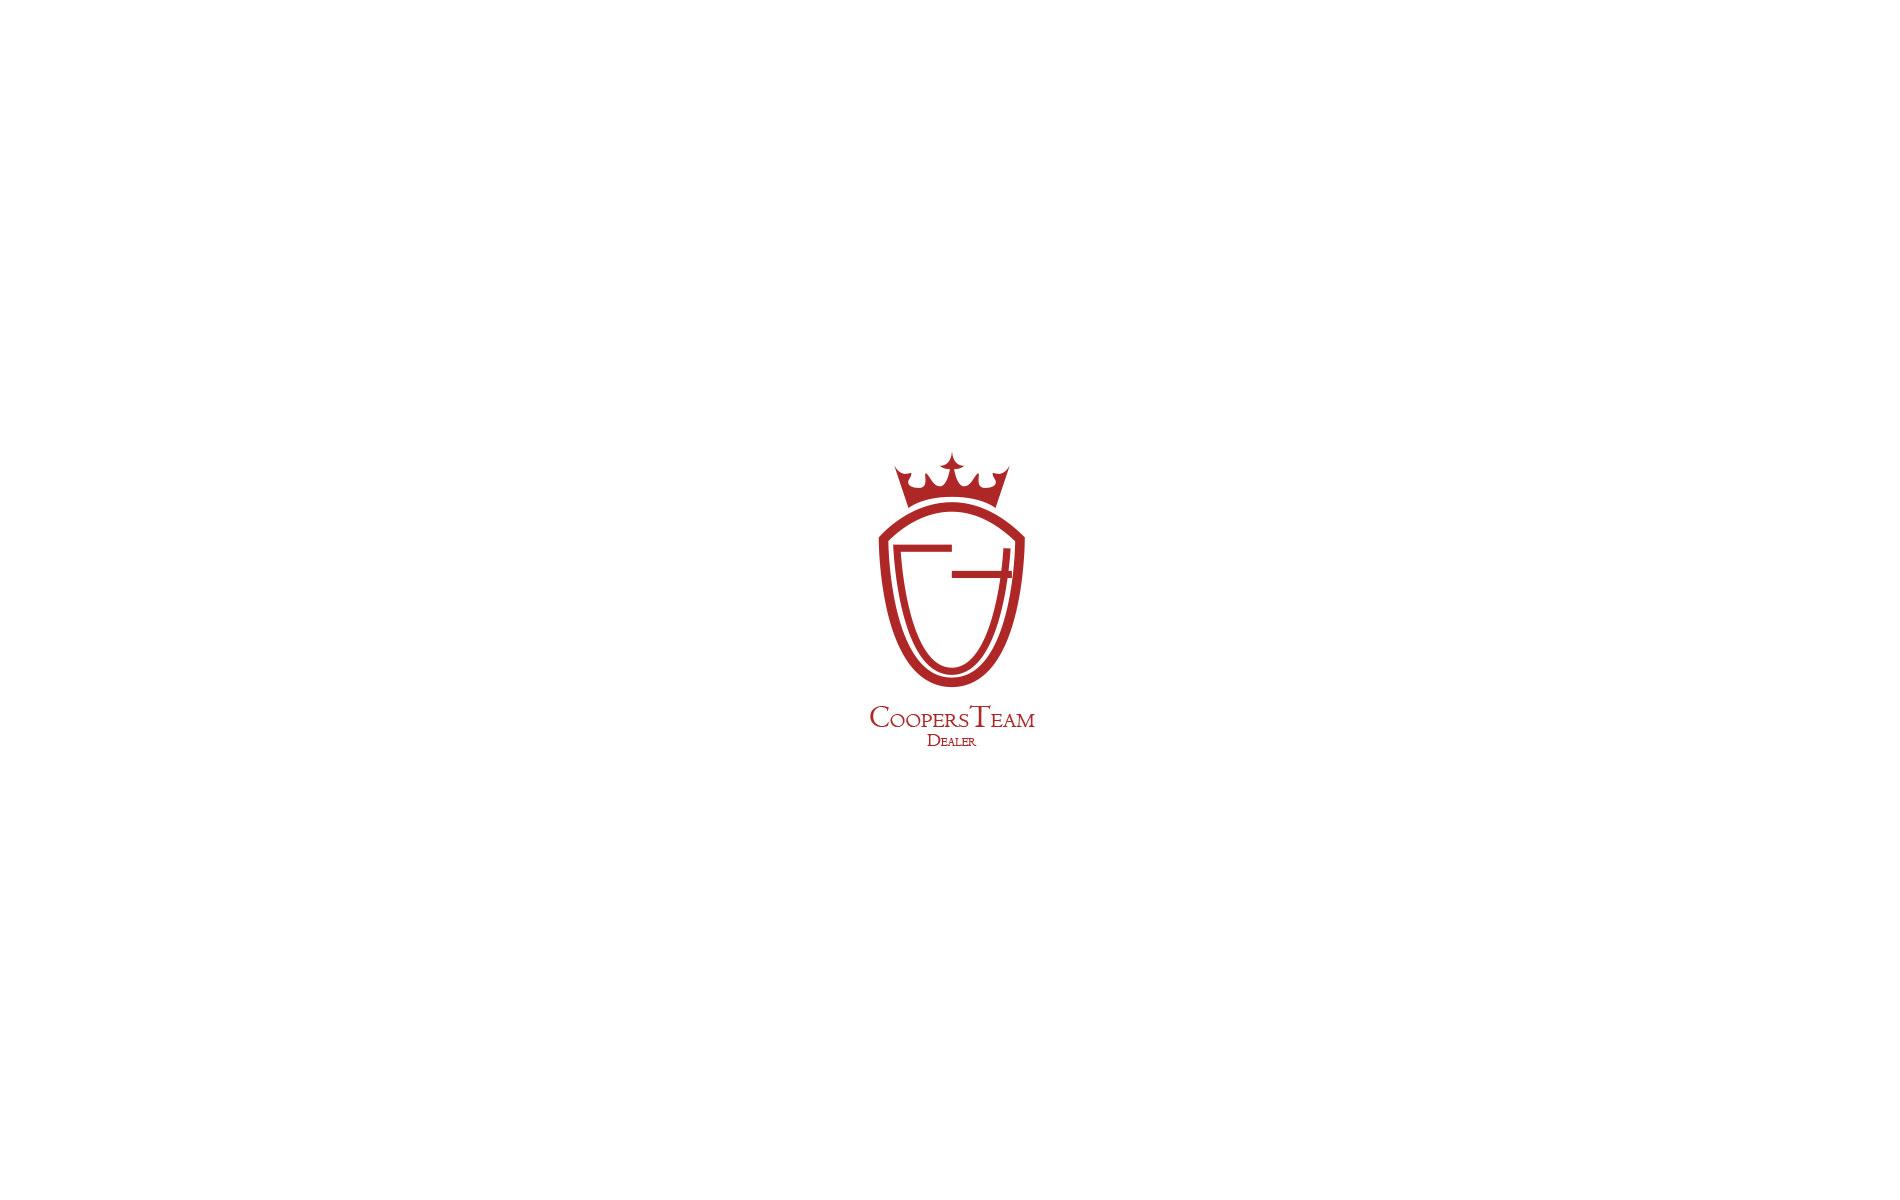 szablon-portfolio-bg